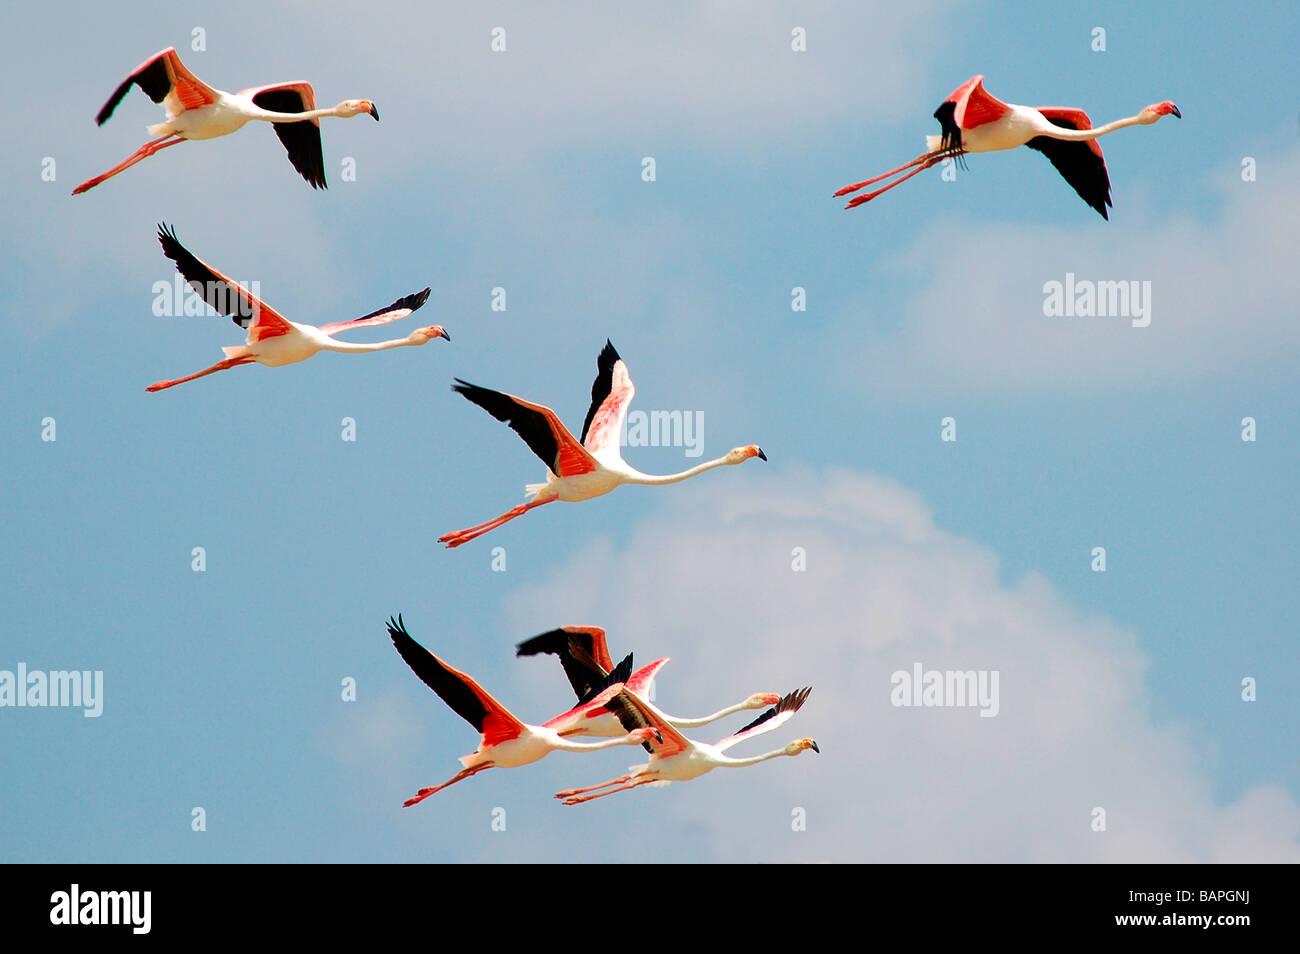 Flamingos in flight at koothankulam, Thirunelvelli District, Tamil Nadu - Stock Image